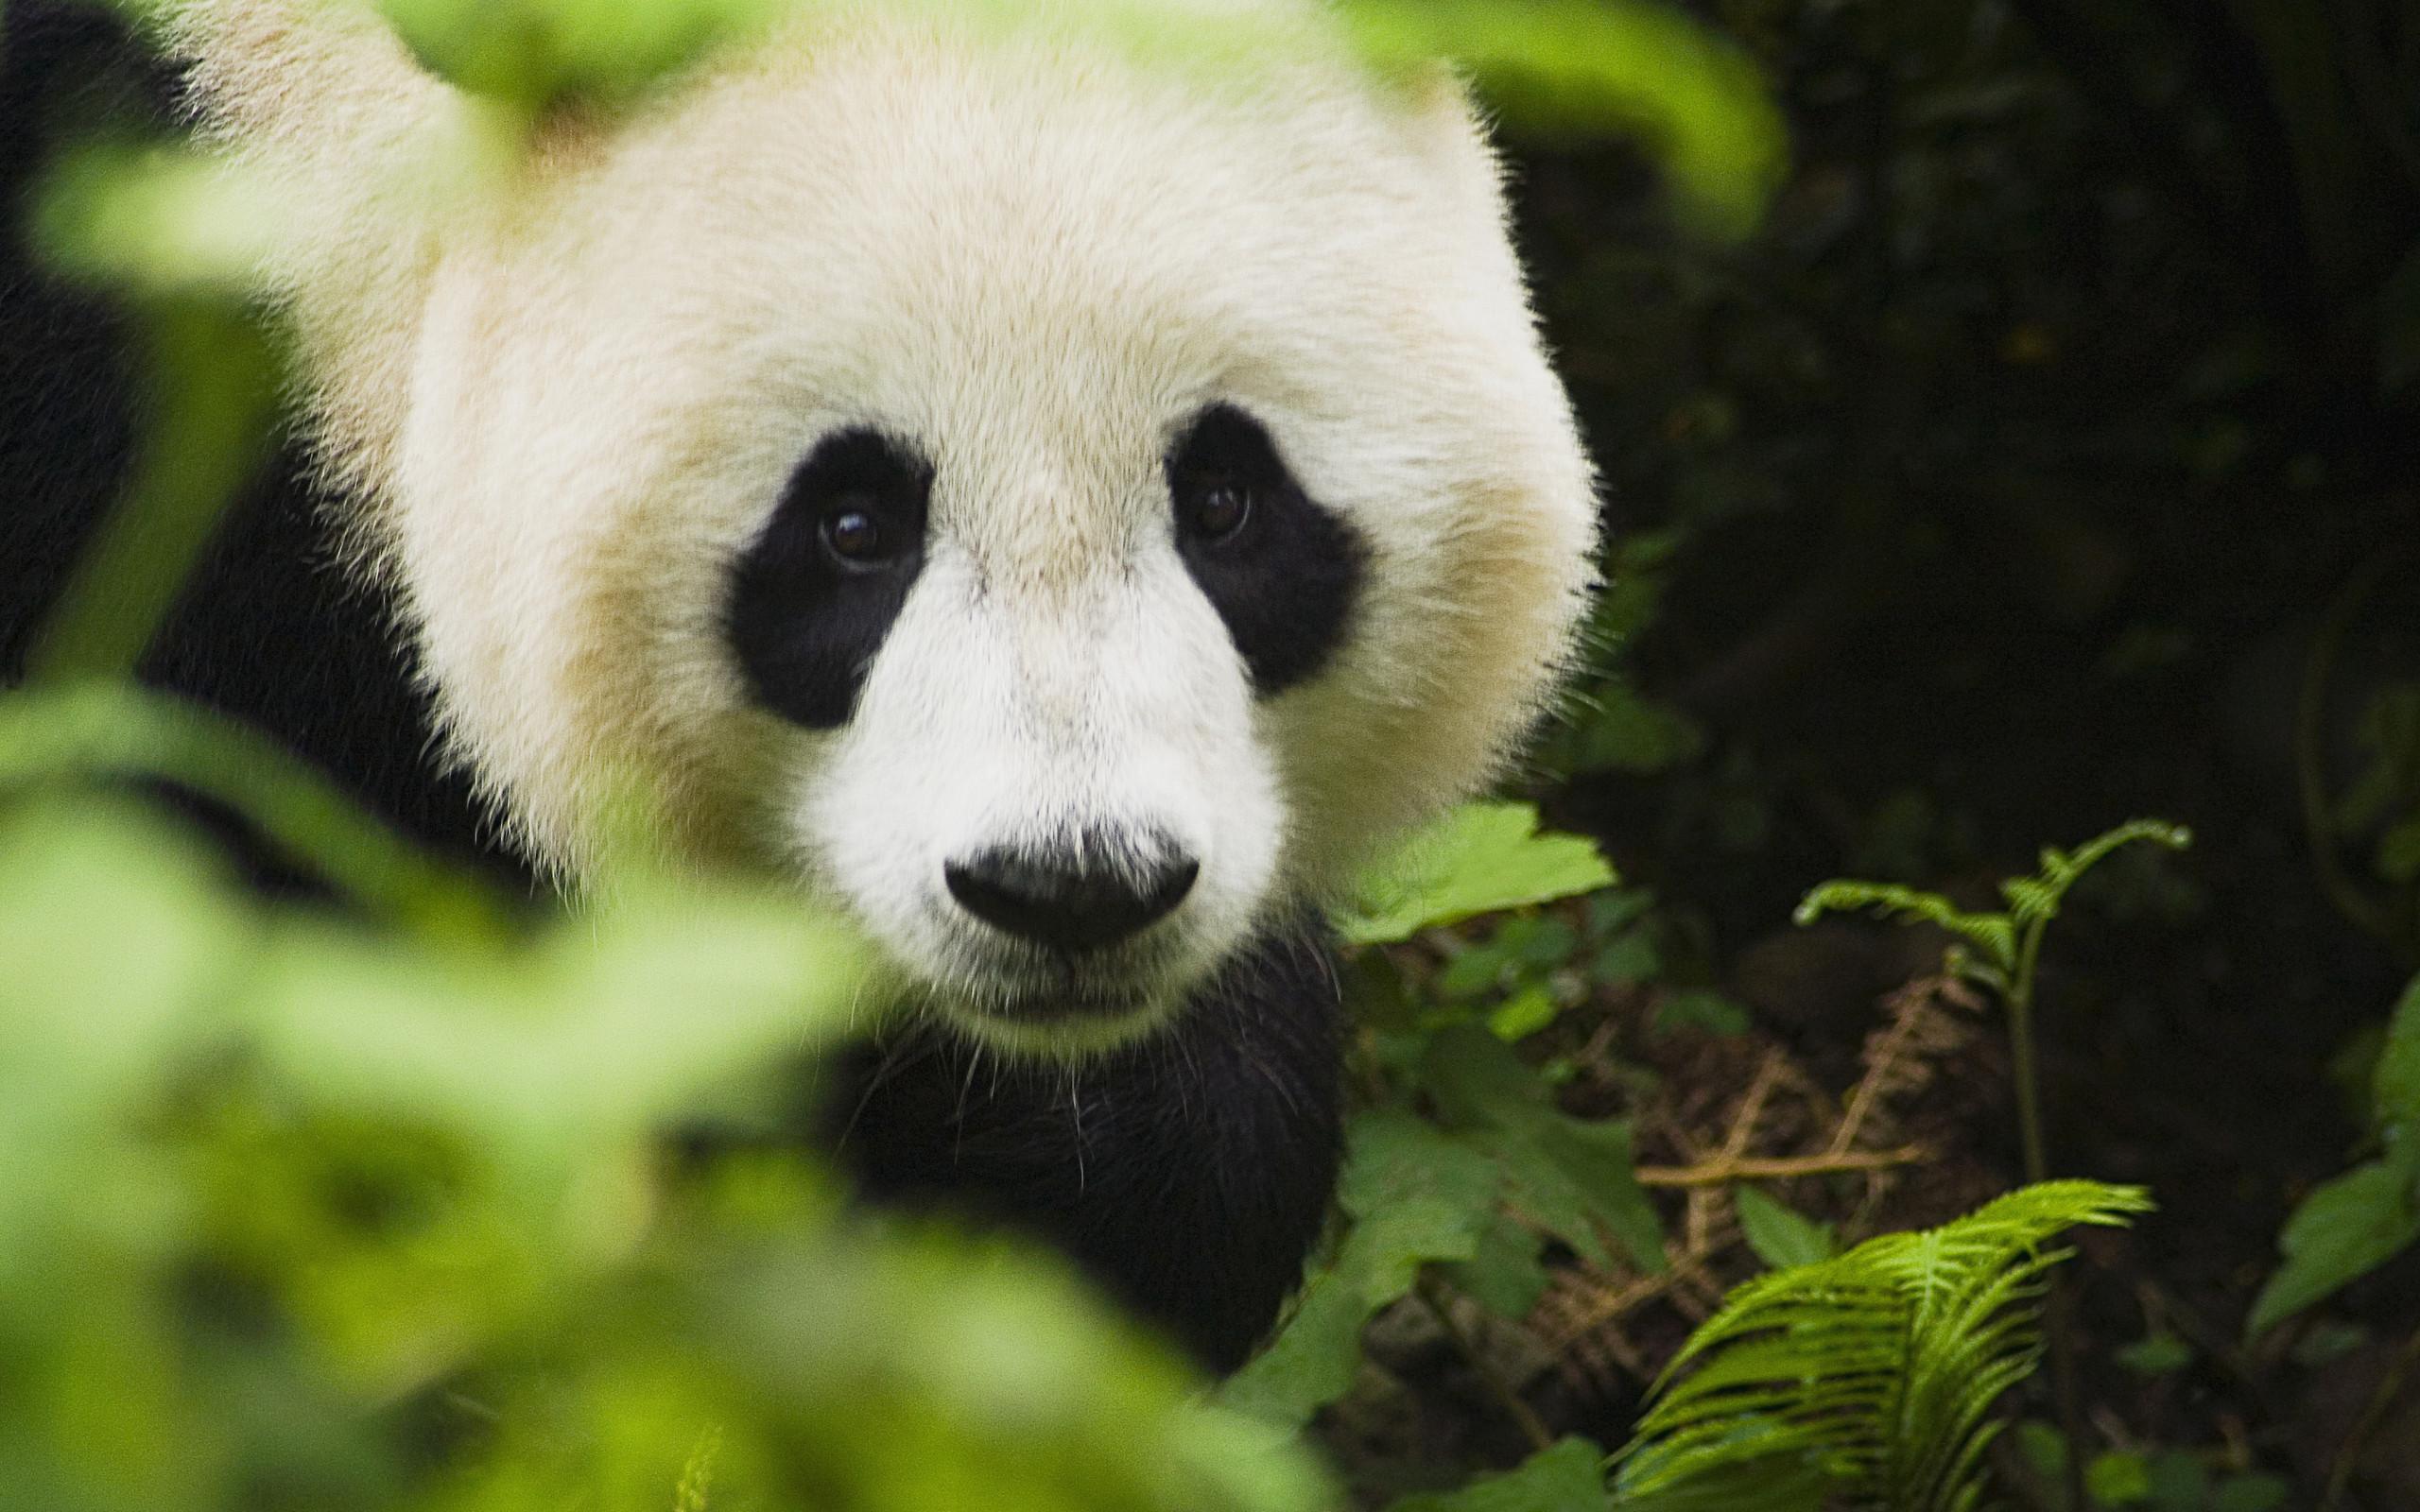 Cute Panda Face Wallpaper IPhone Wallpaper   WallpaperLepi